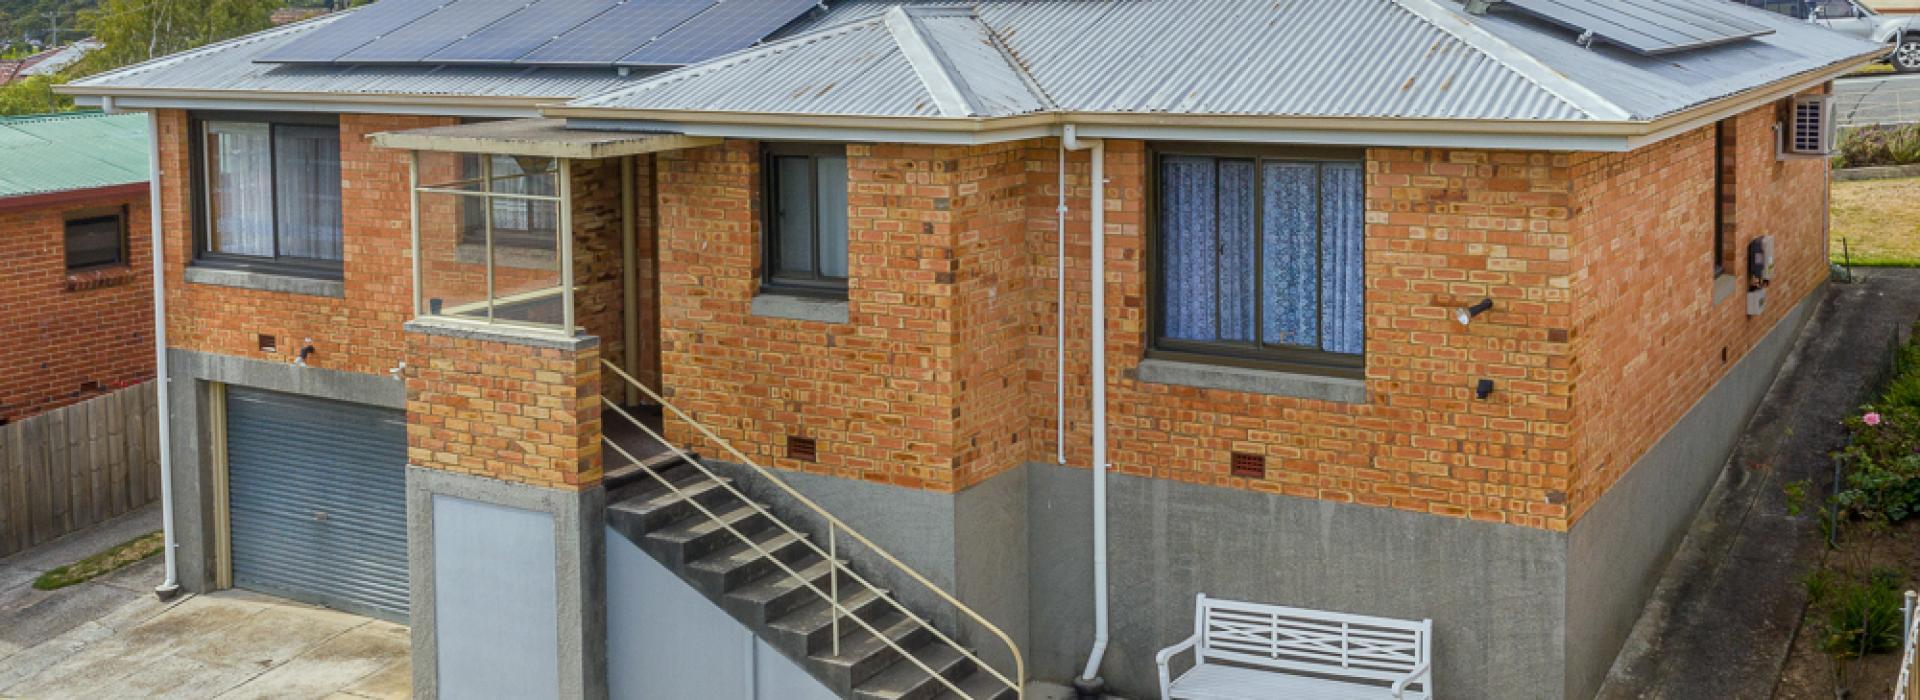 Flanagan Residential | Rae Smith | Property Sales | Kings Meadows